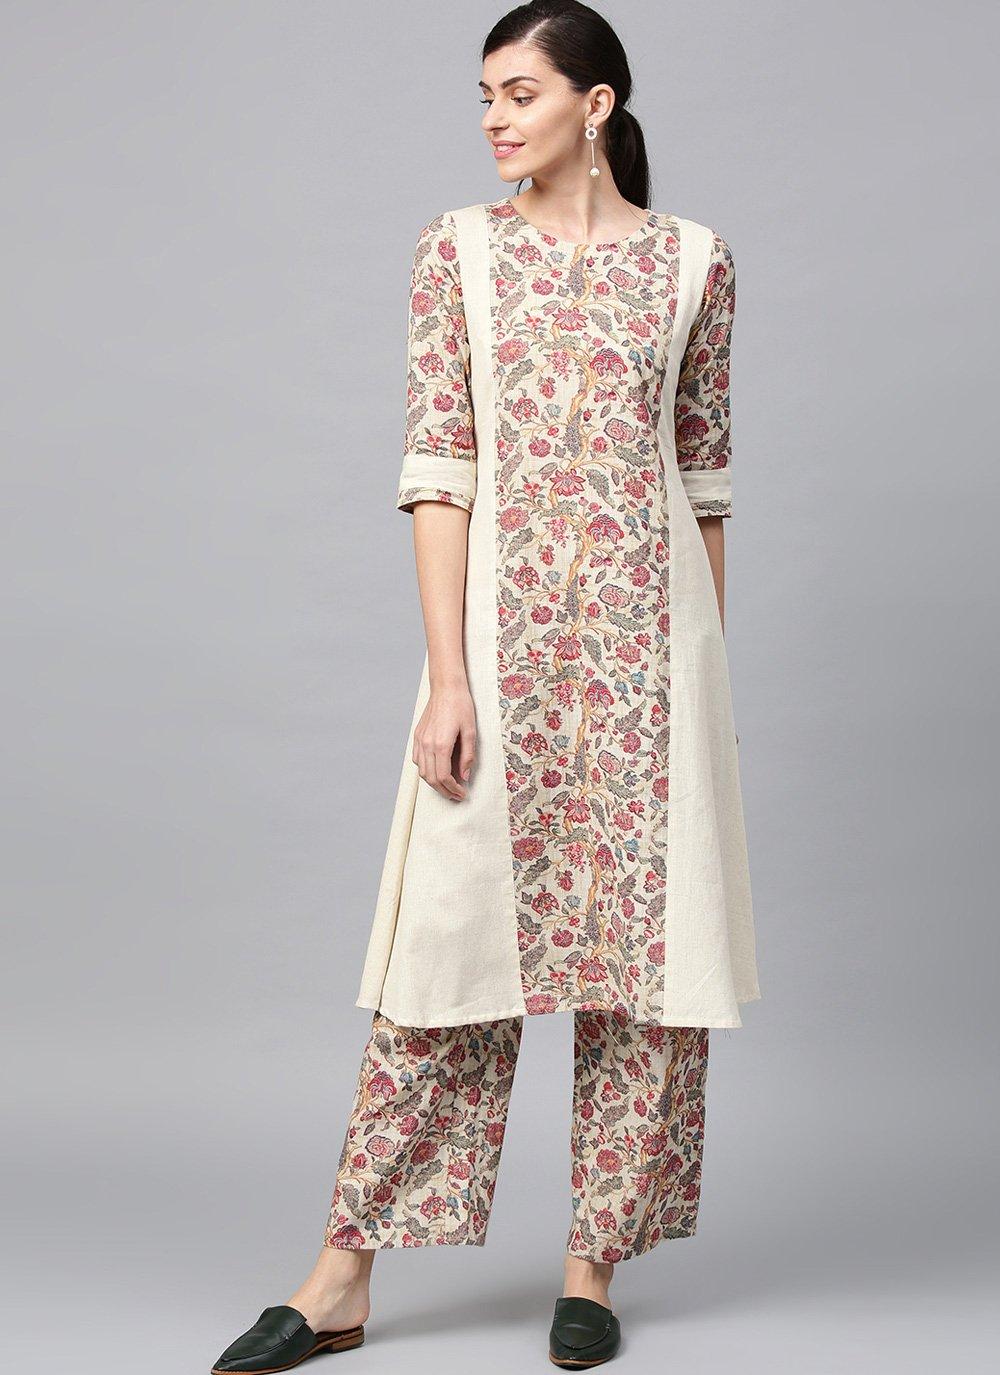 Print Fancy Fabric Off White Casual Kurti